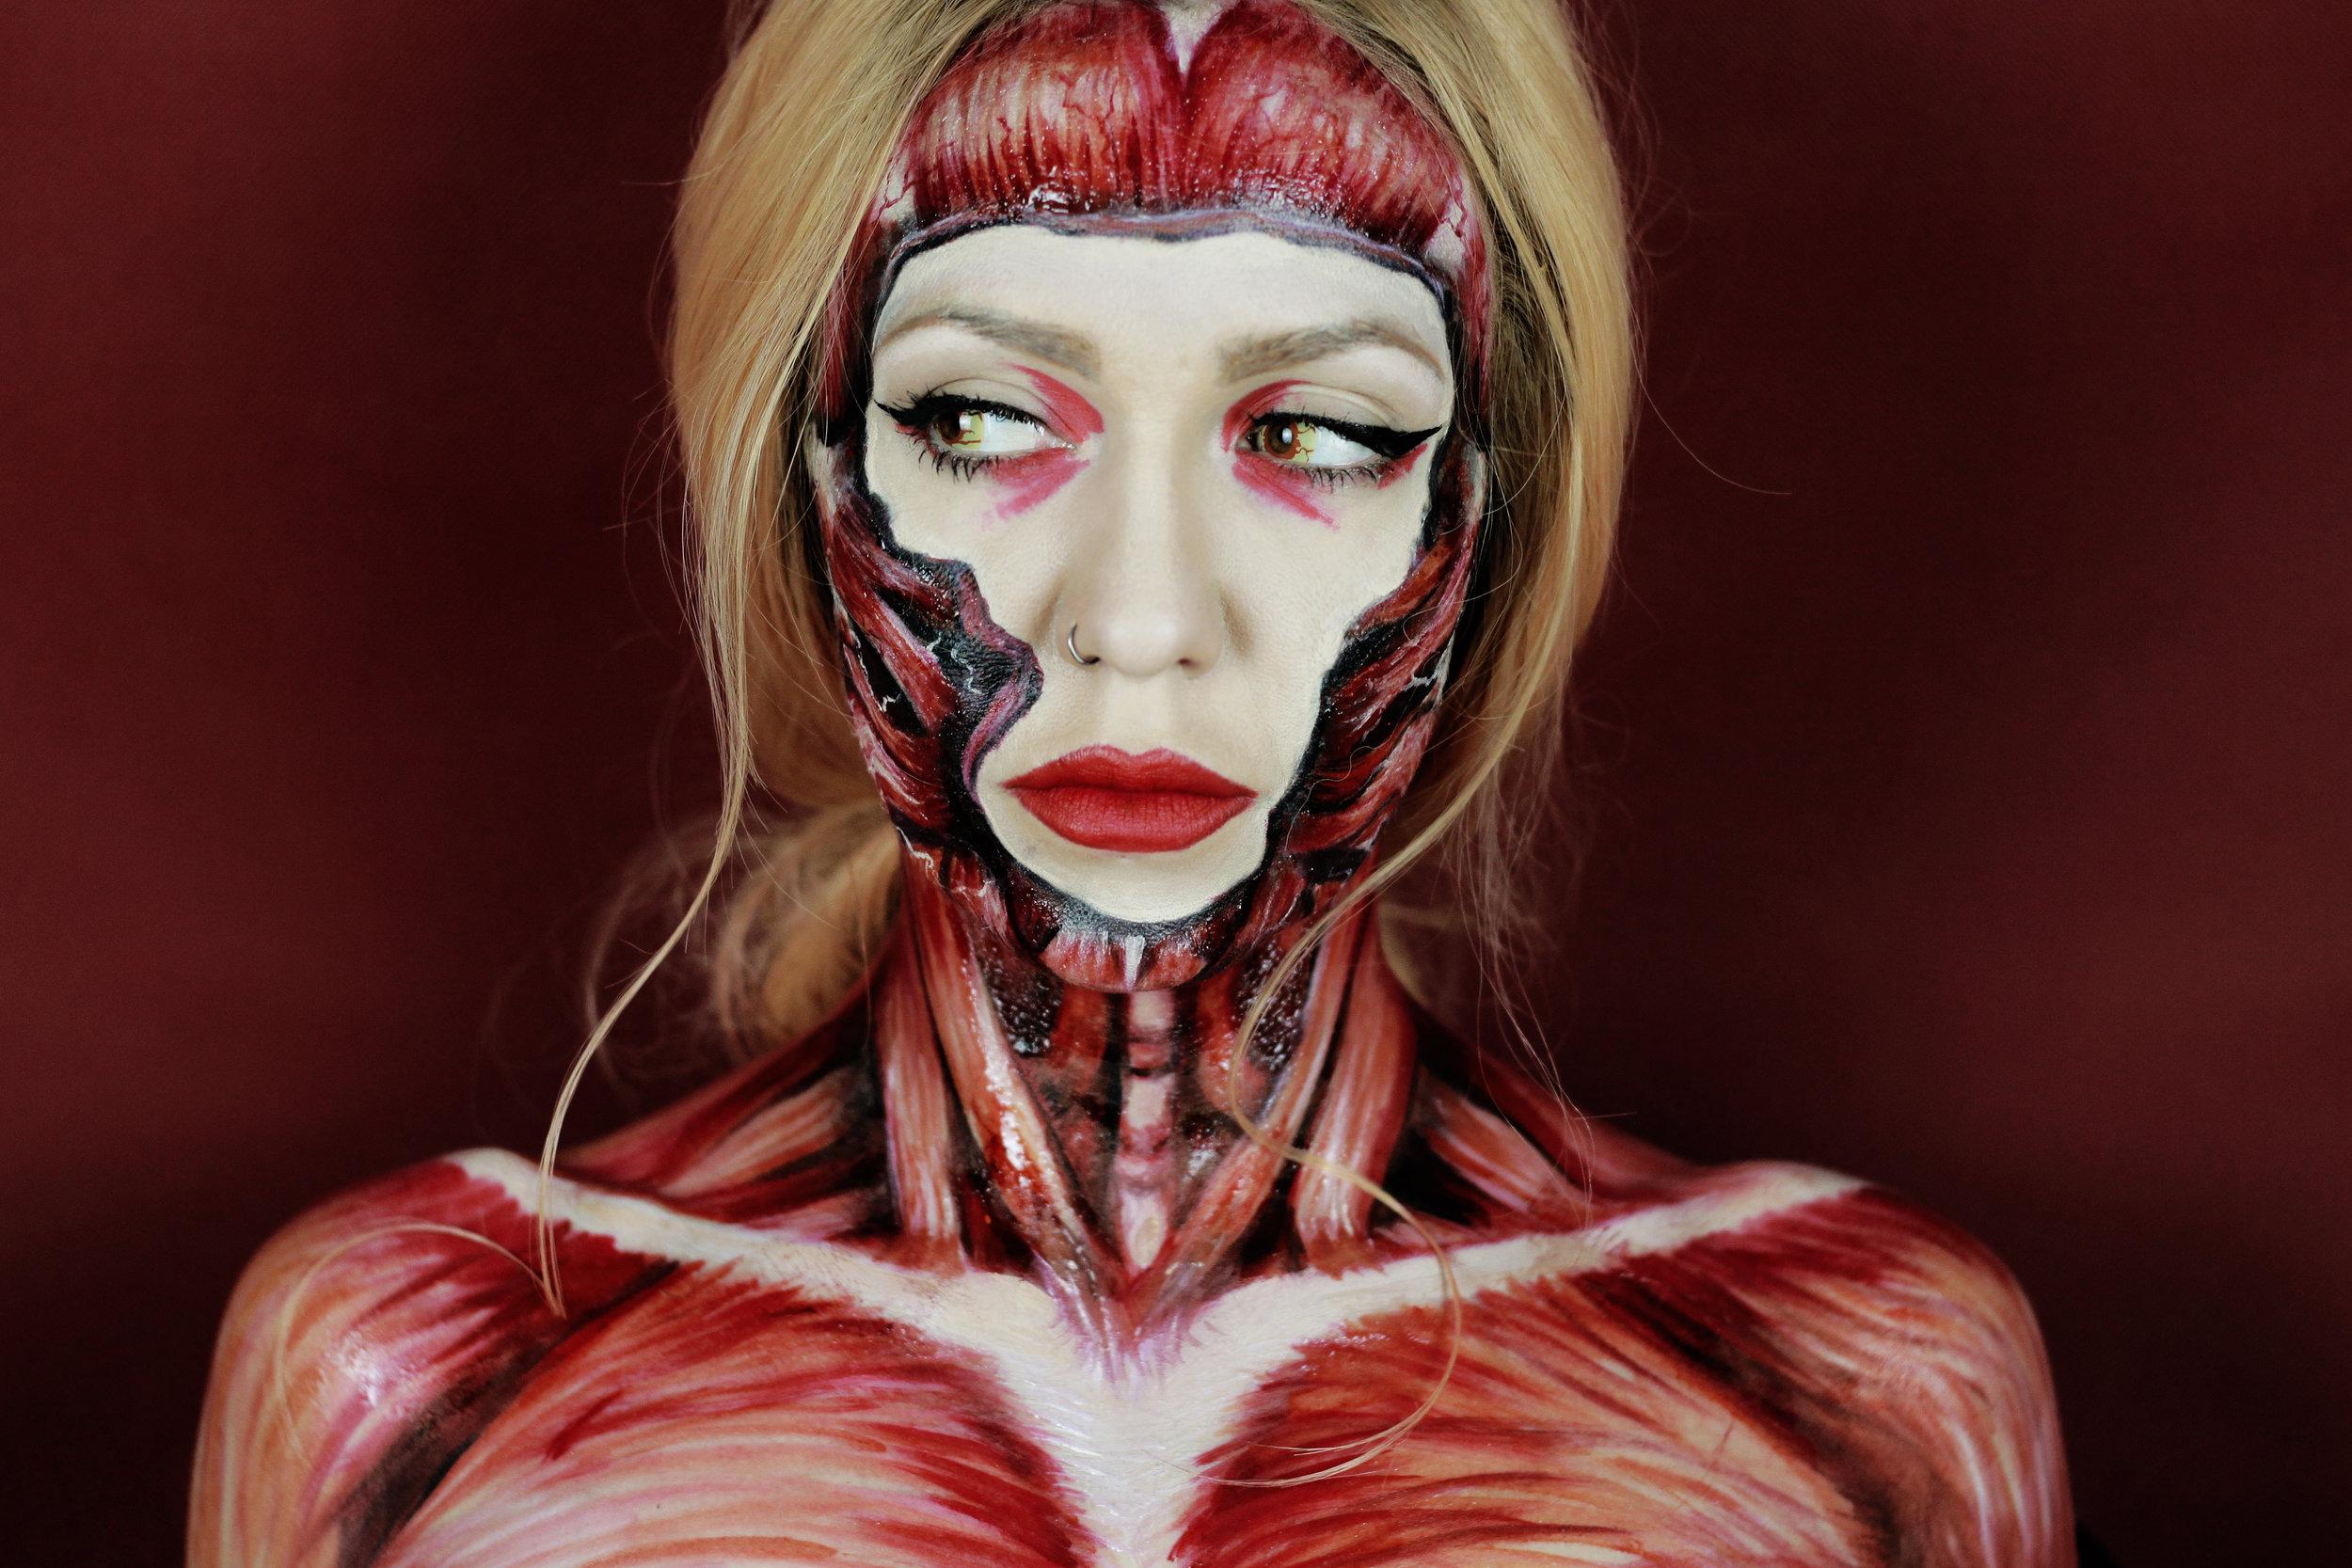 FX Makeup by MetamorphosiaFX